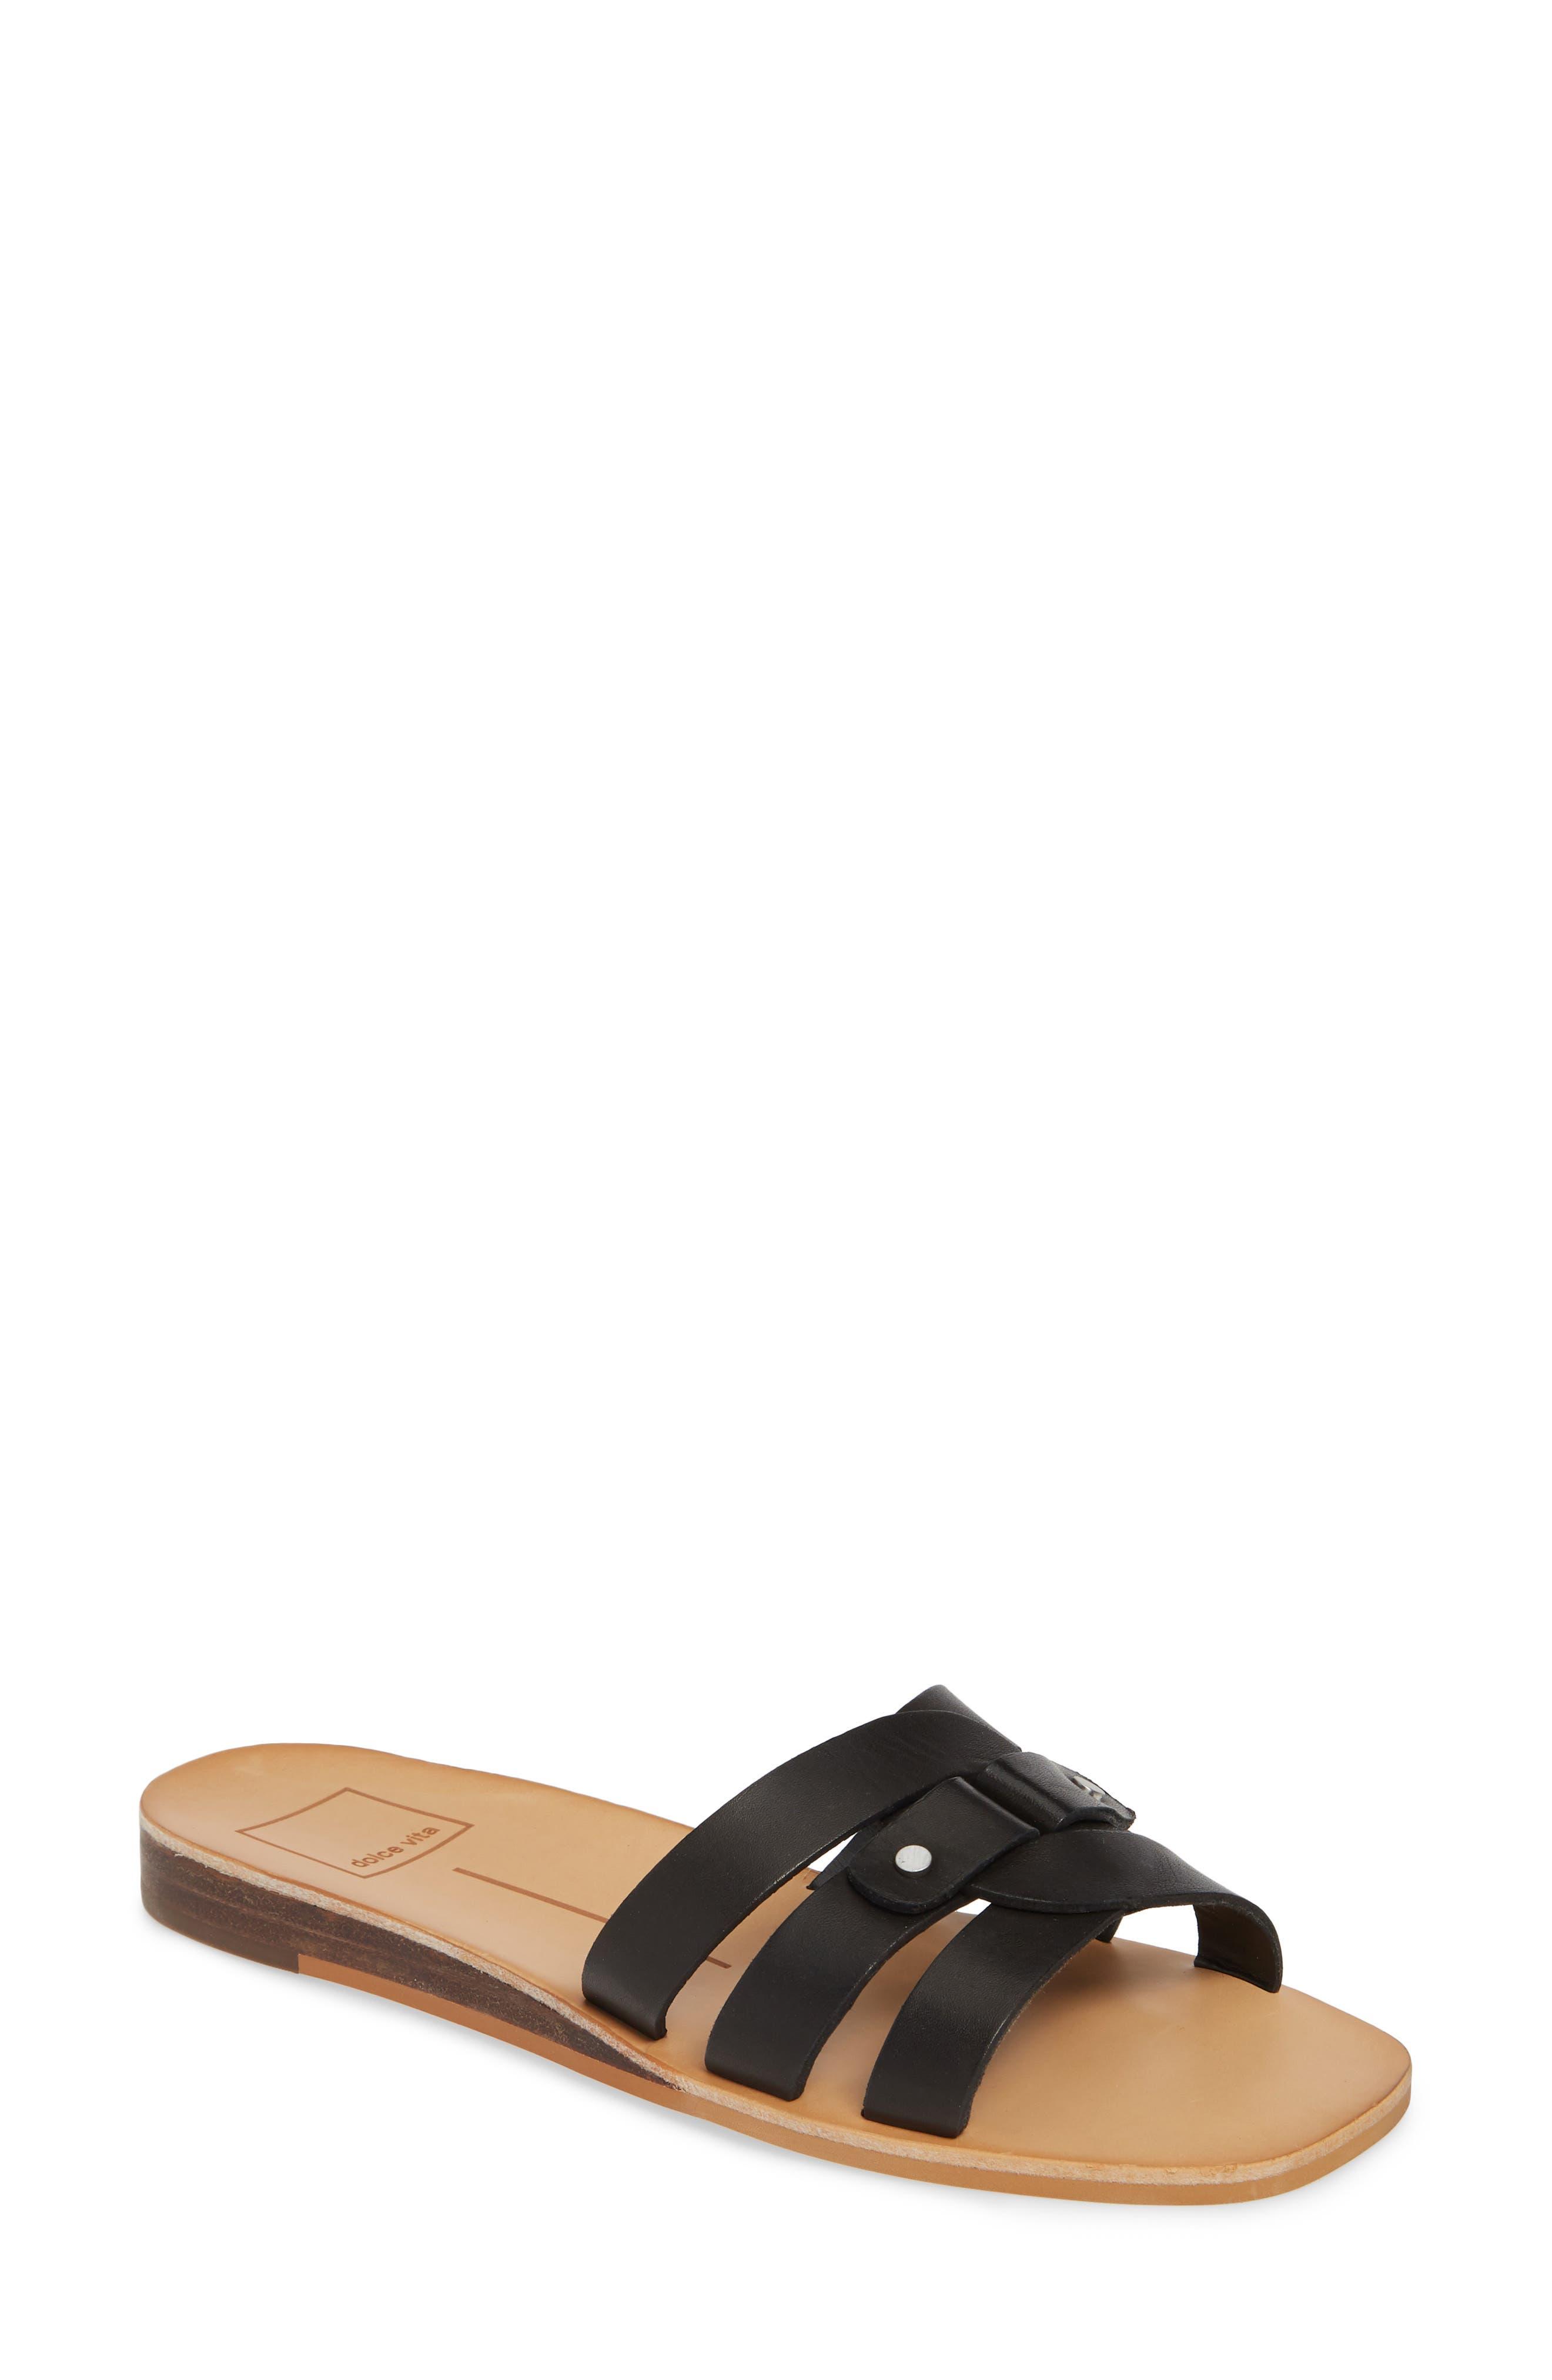 Cait Slide Sandal by Dolce Vita